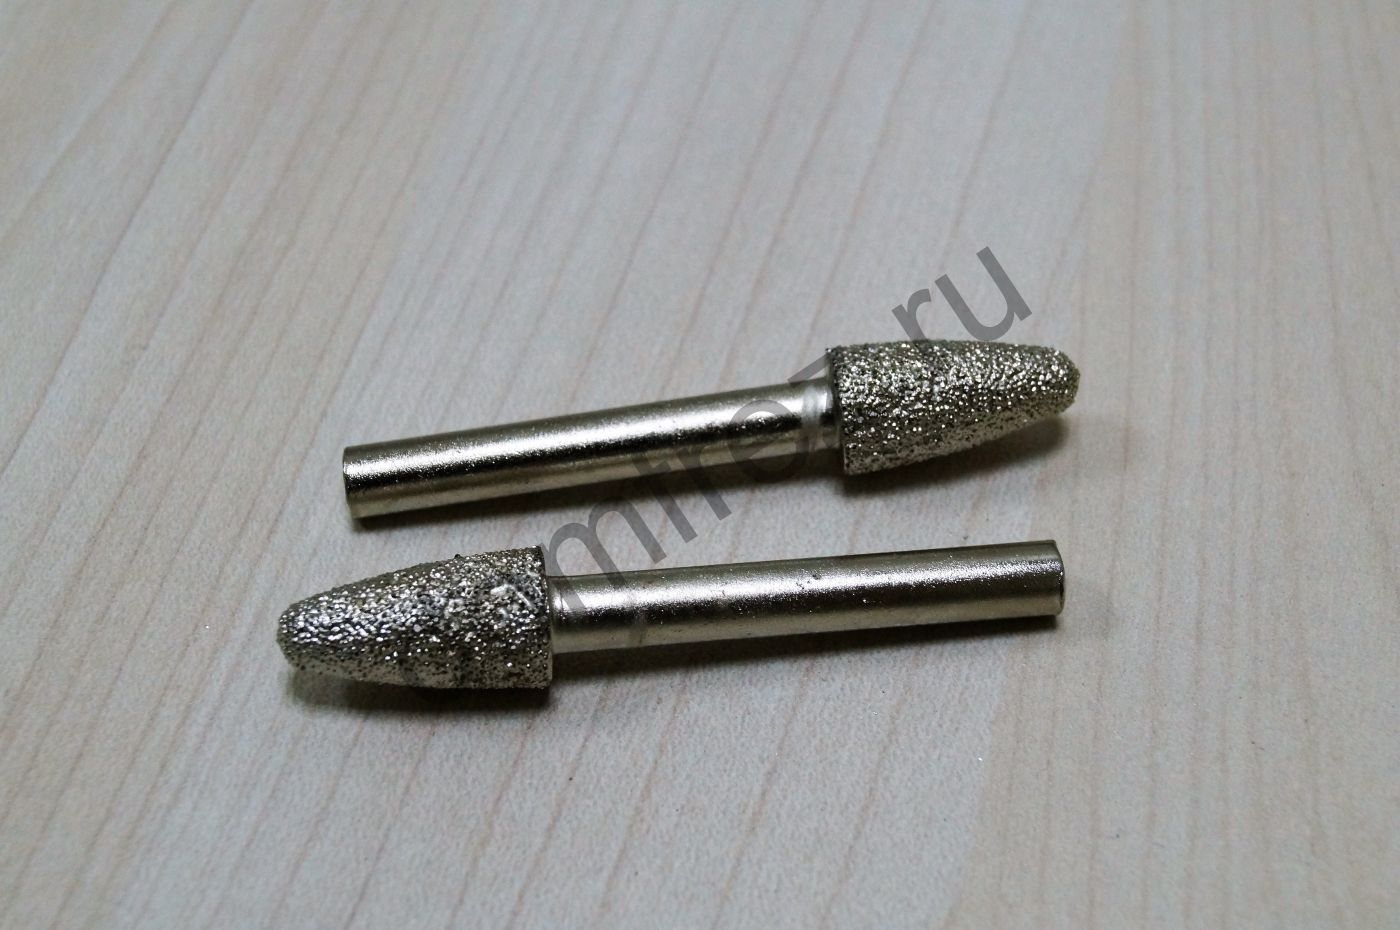 Фреза алмазная концевая фасонная №14 6x10х20x60 A8910614